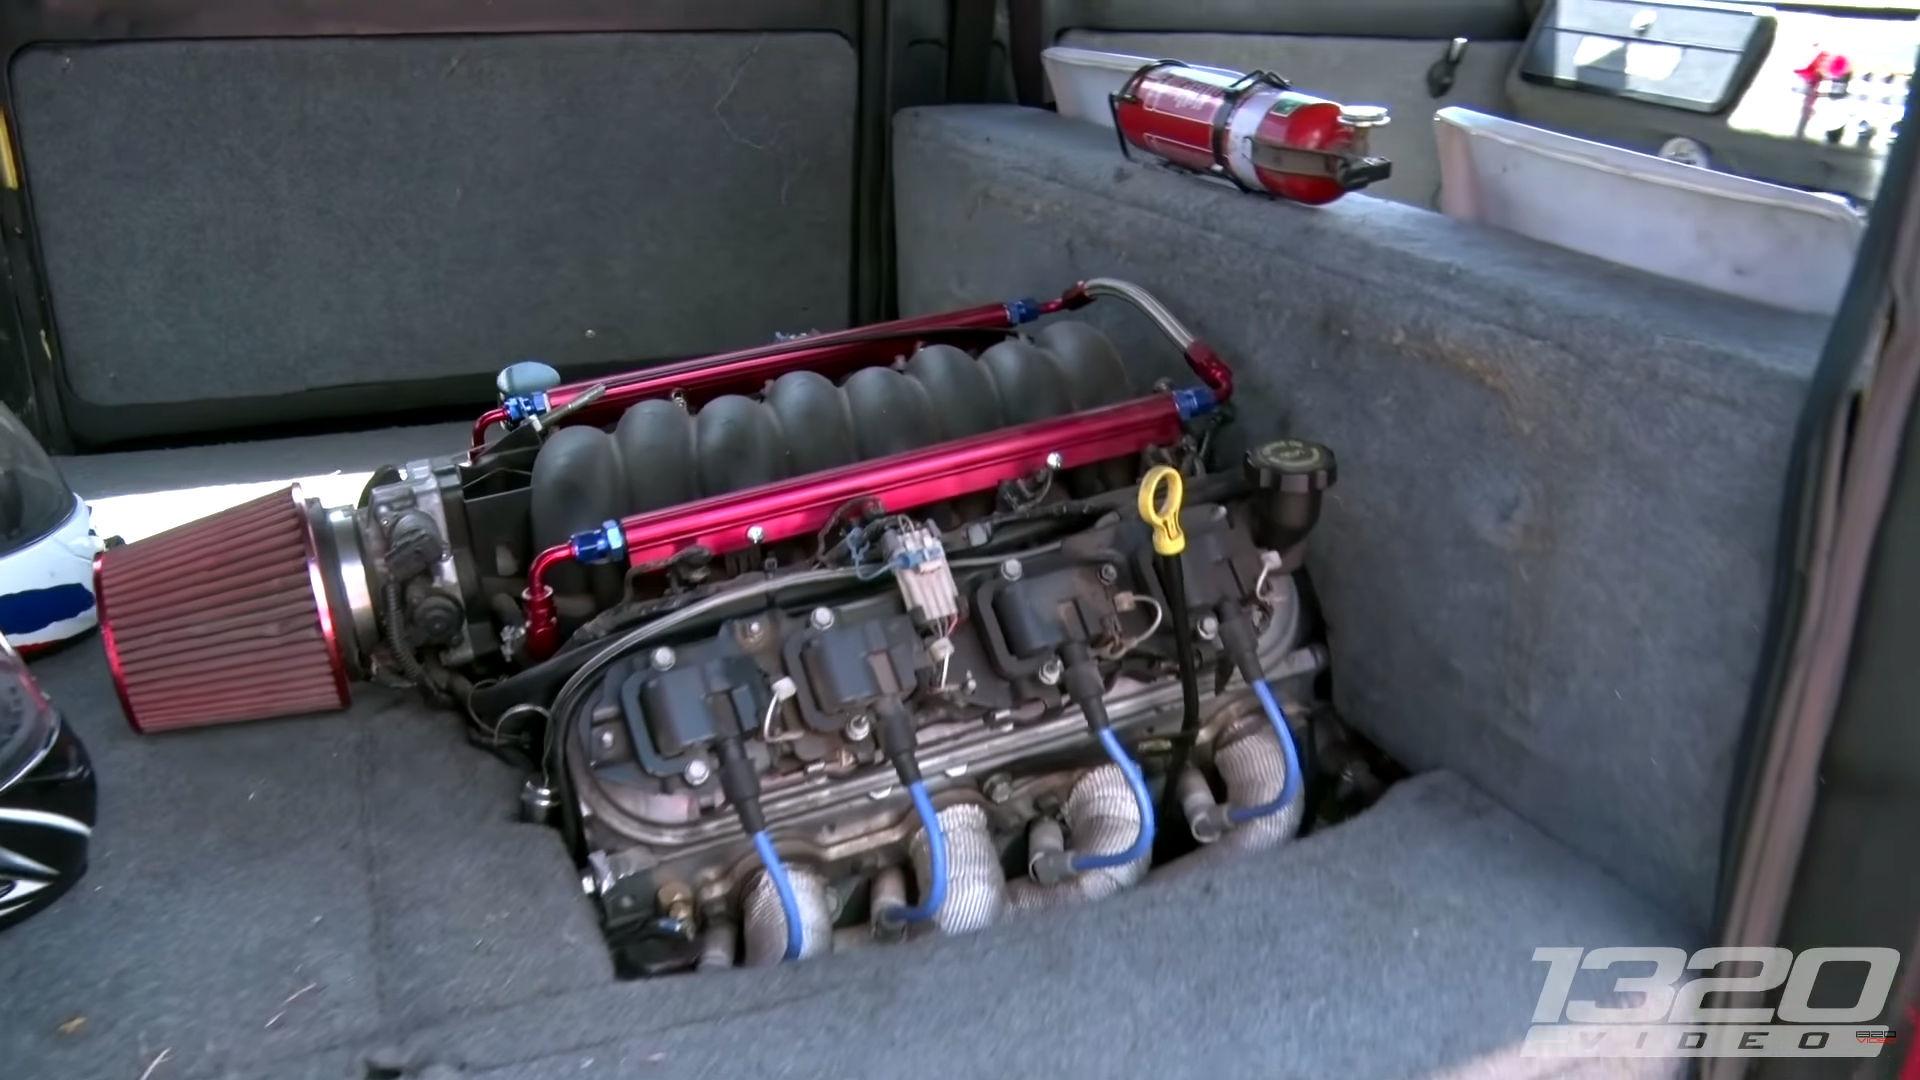 Watch This 1500-Pound Australian Subaru Microvan Totally Fry